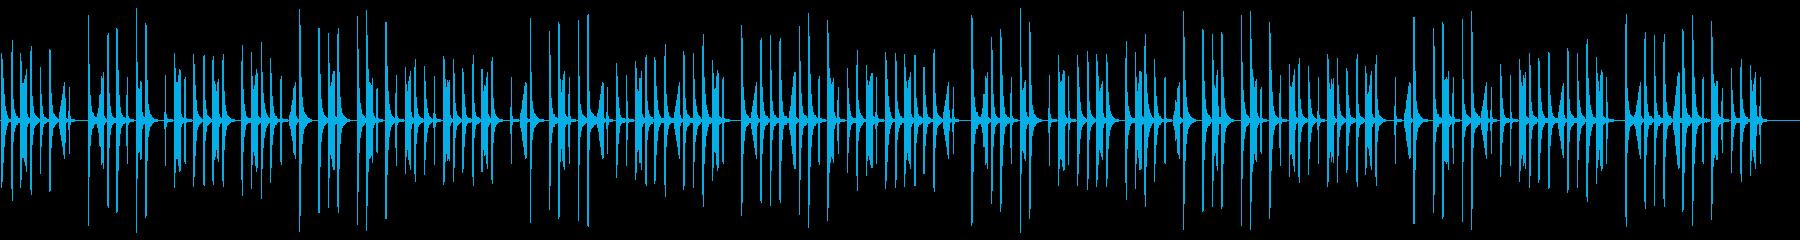 CM、木琴、説明、商品紹介系BGM6の再生済みの波形